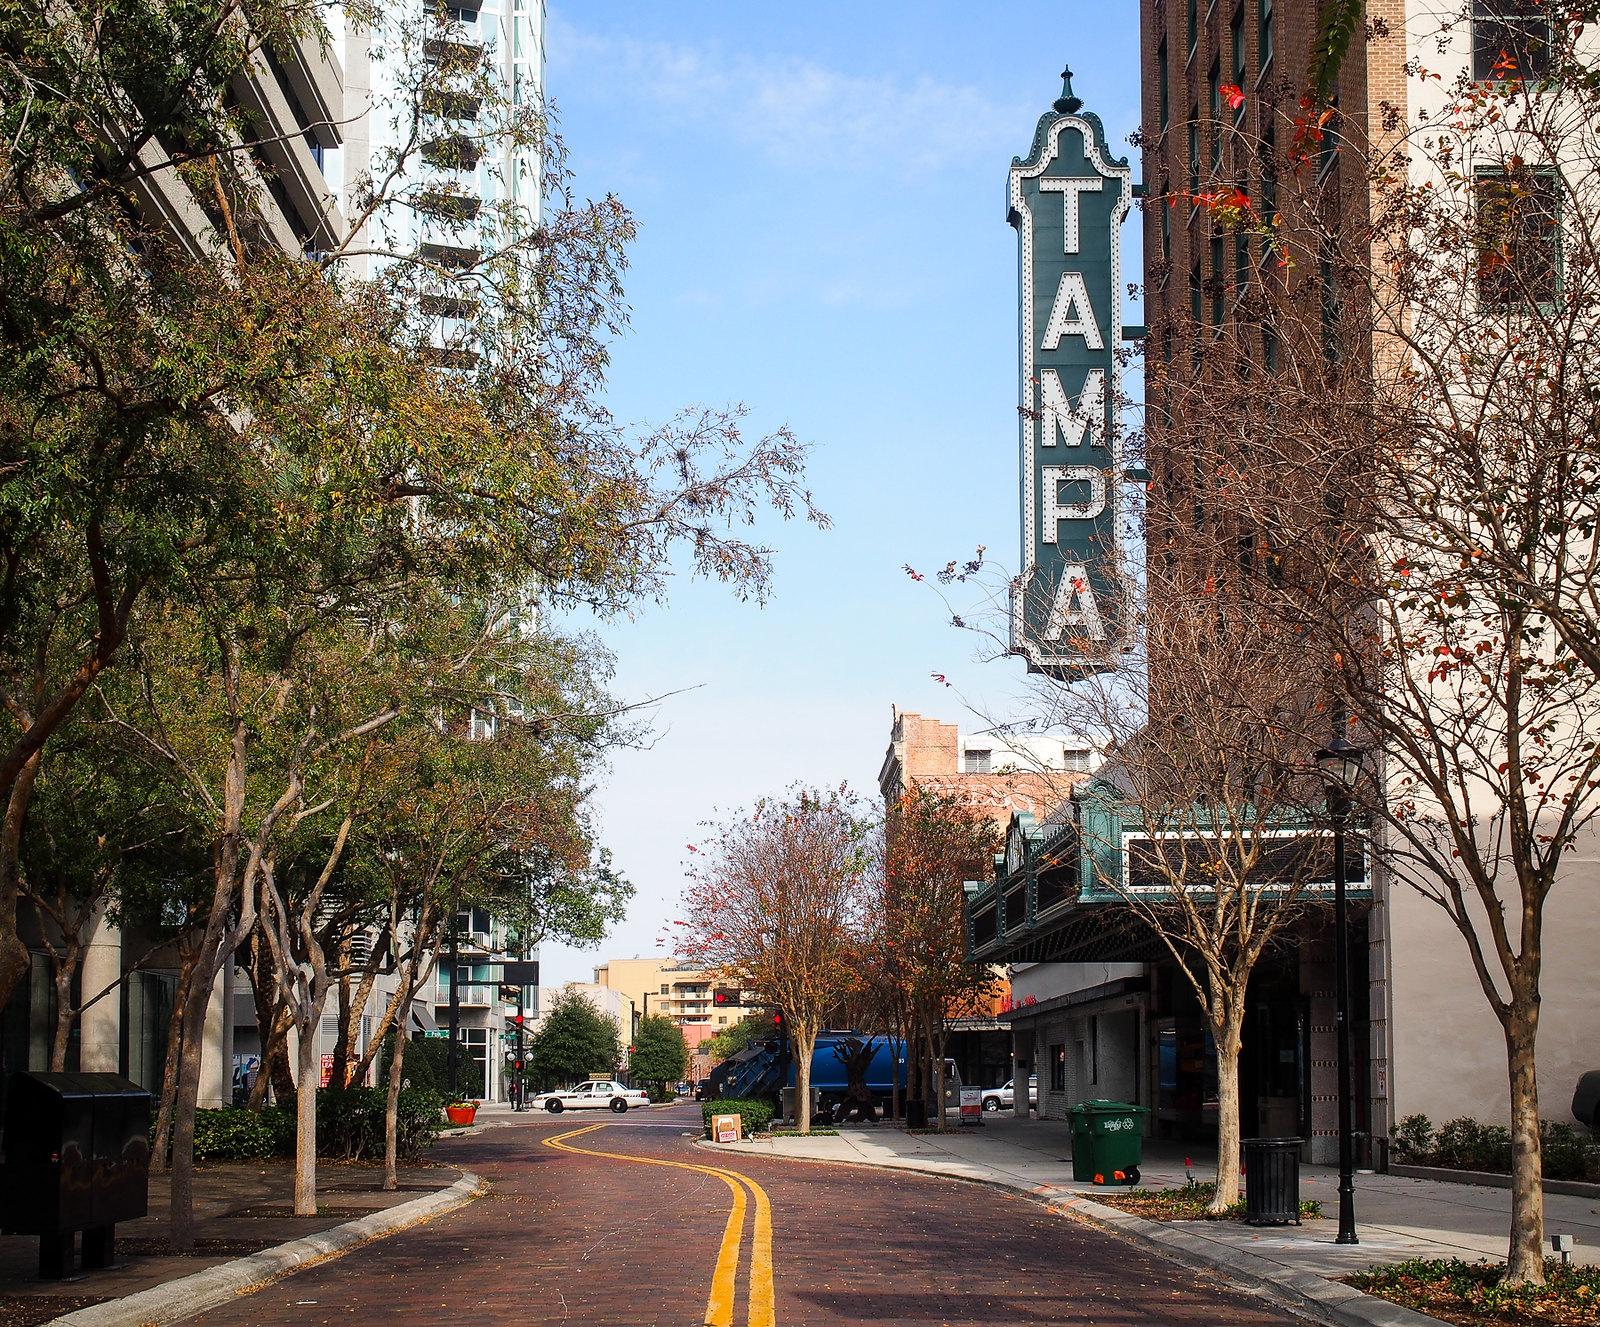 Tampa theatre sign